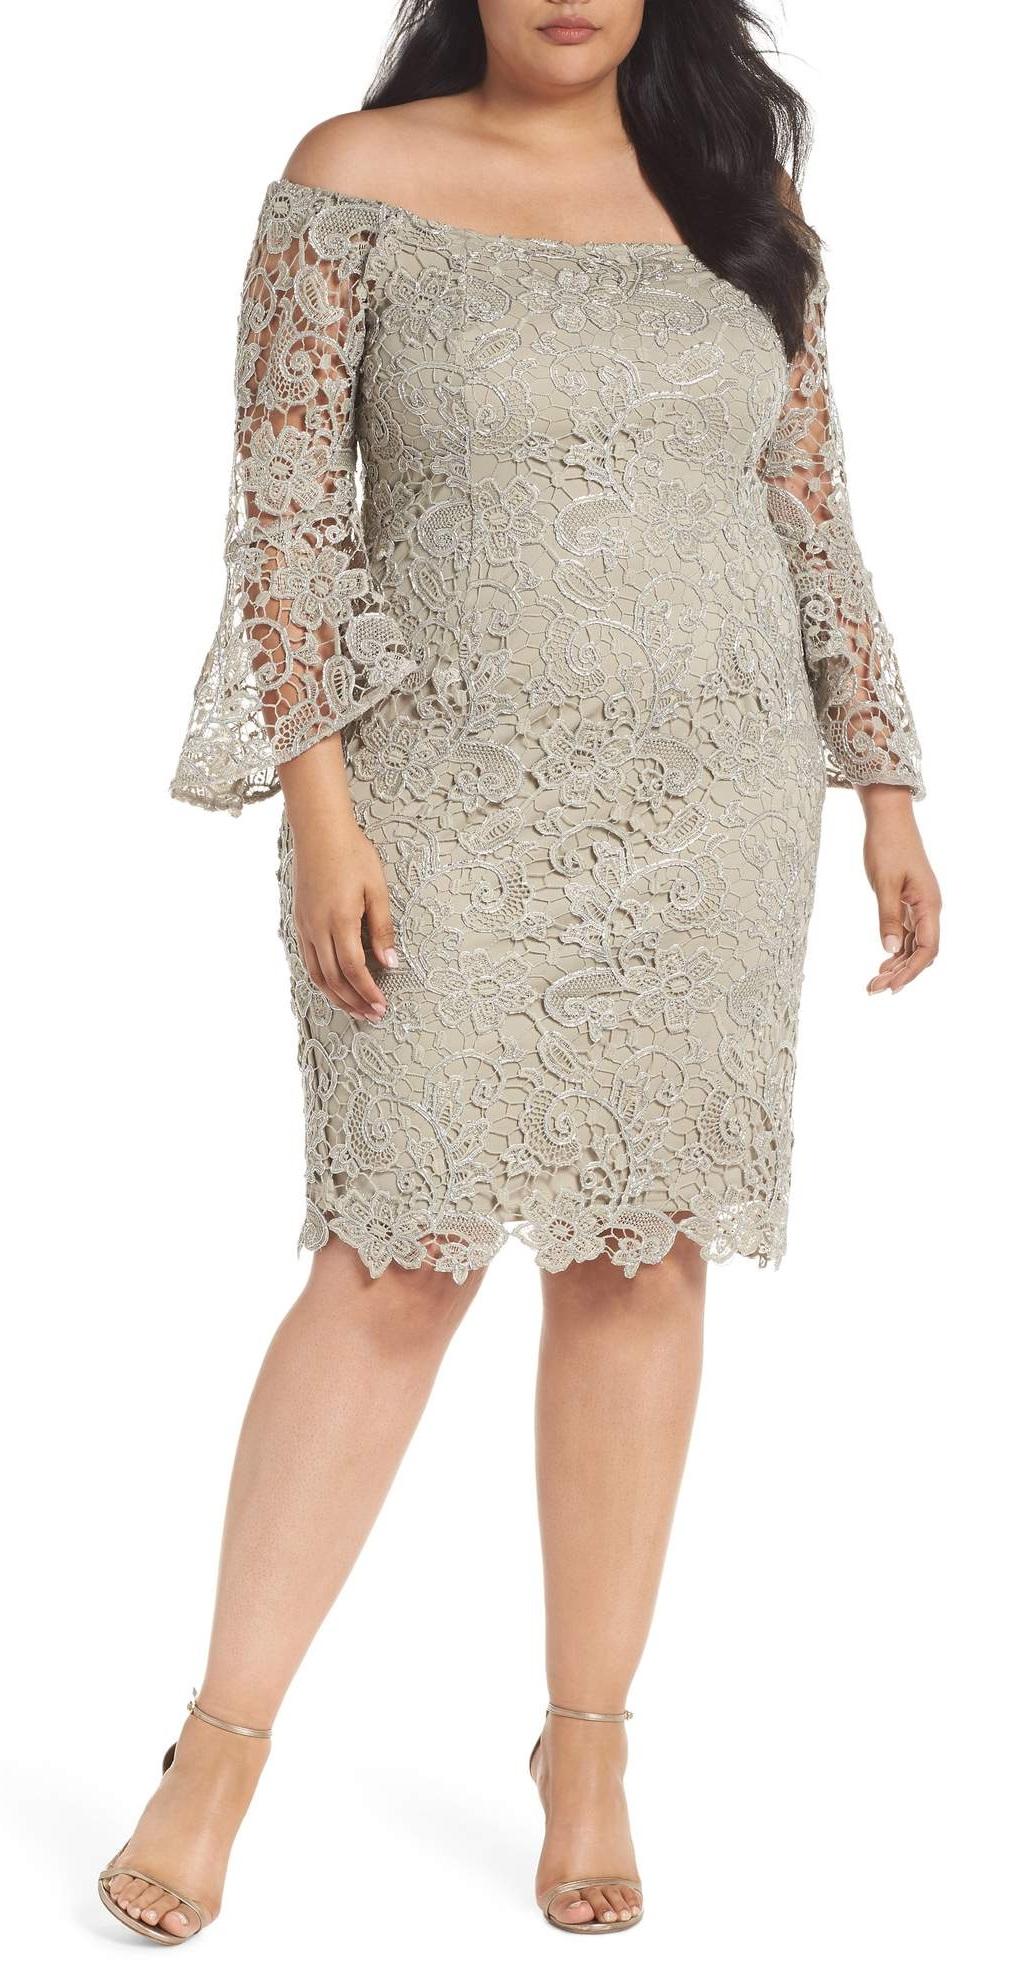 plus-size-summer-wedding-guest-dress-sleeves-alexawebb-518-24 ...